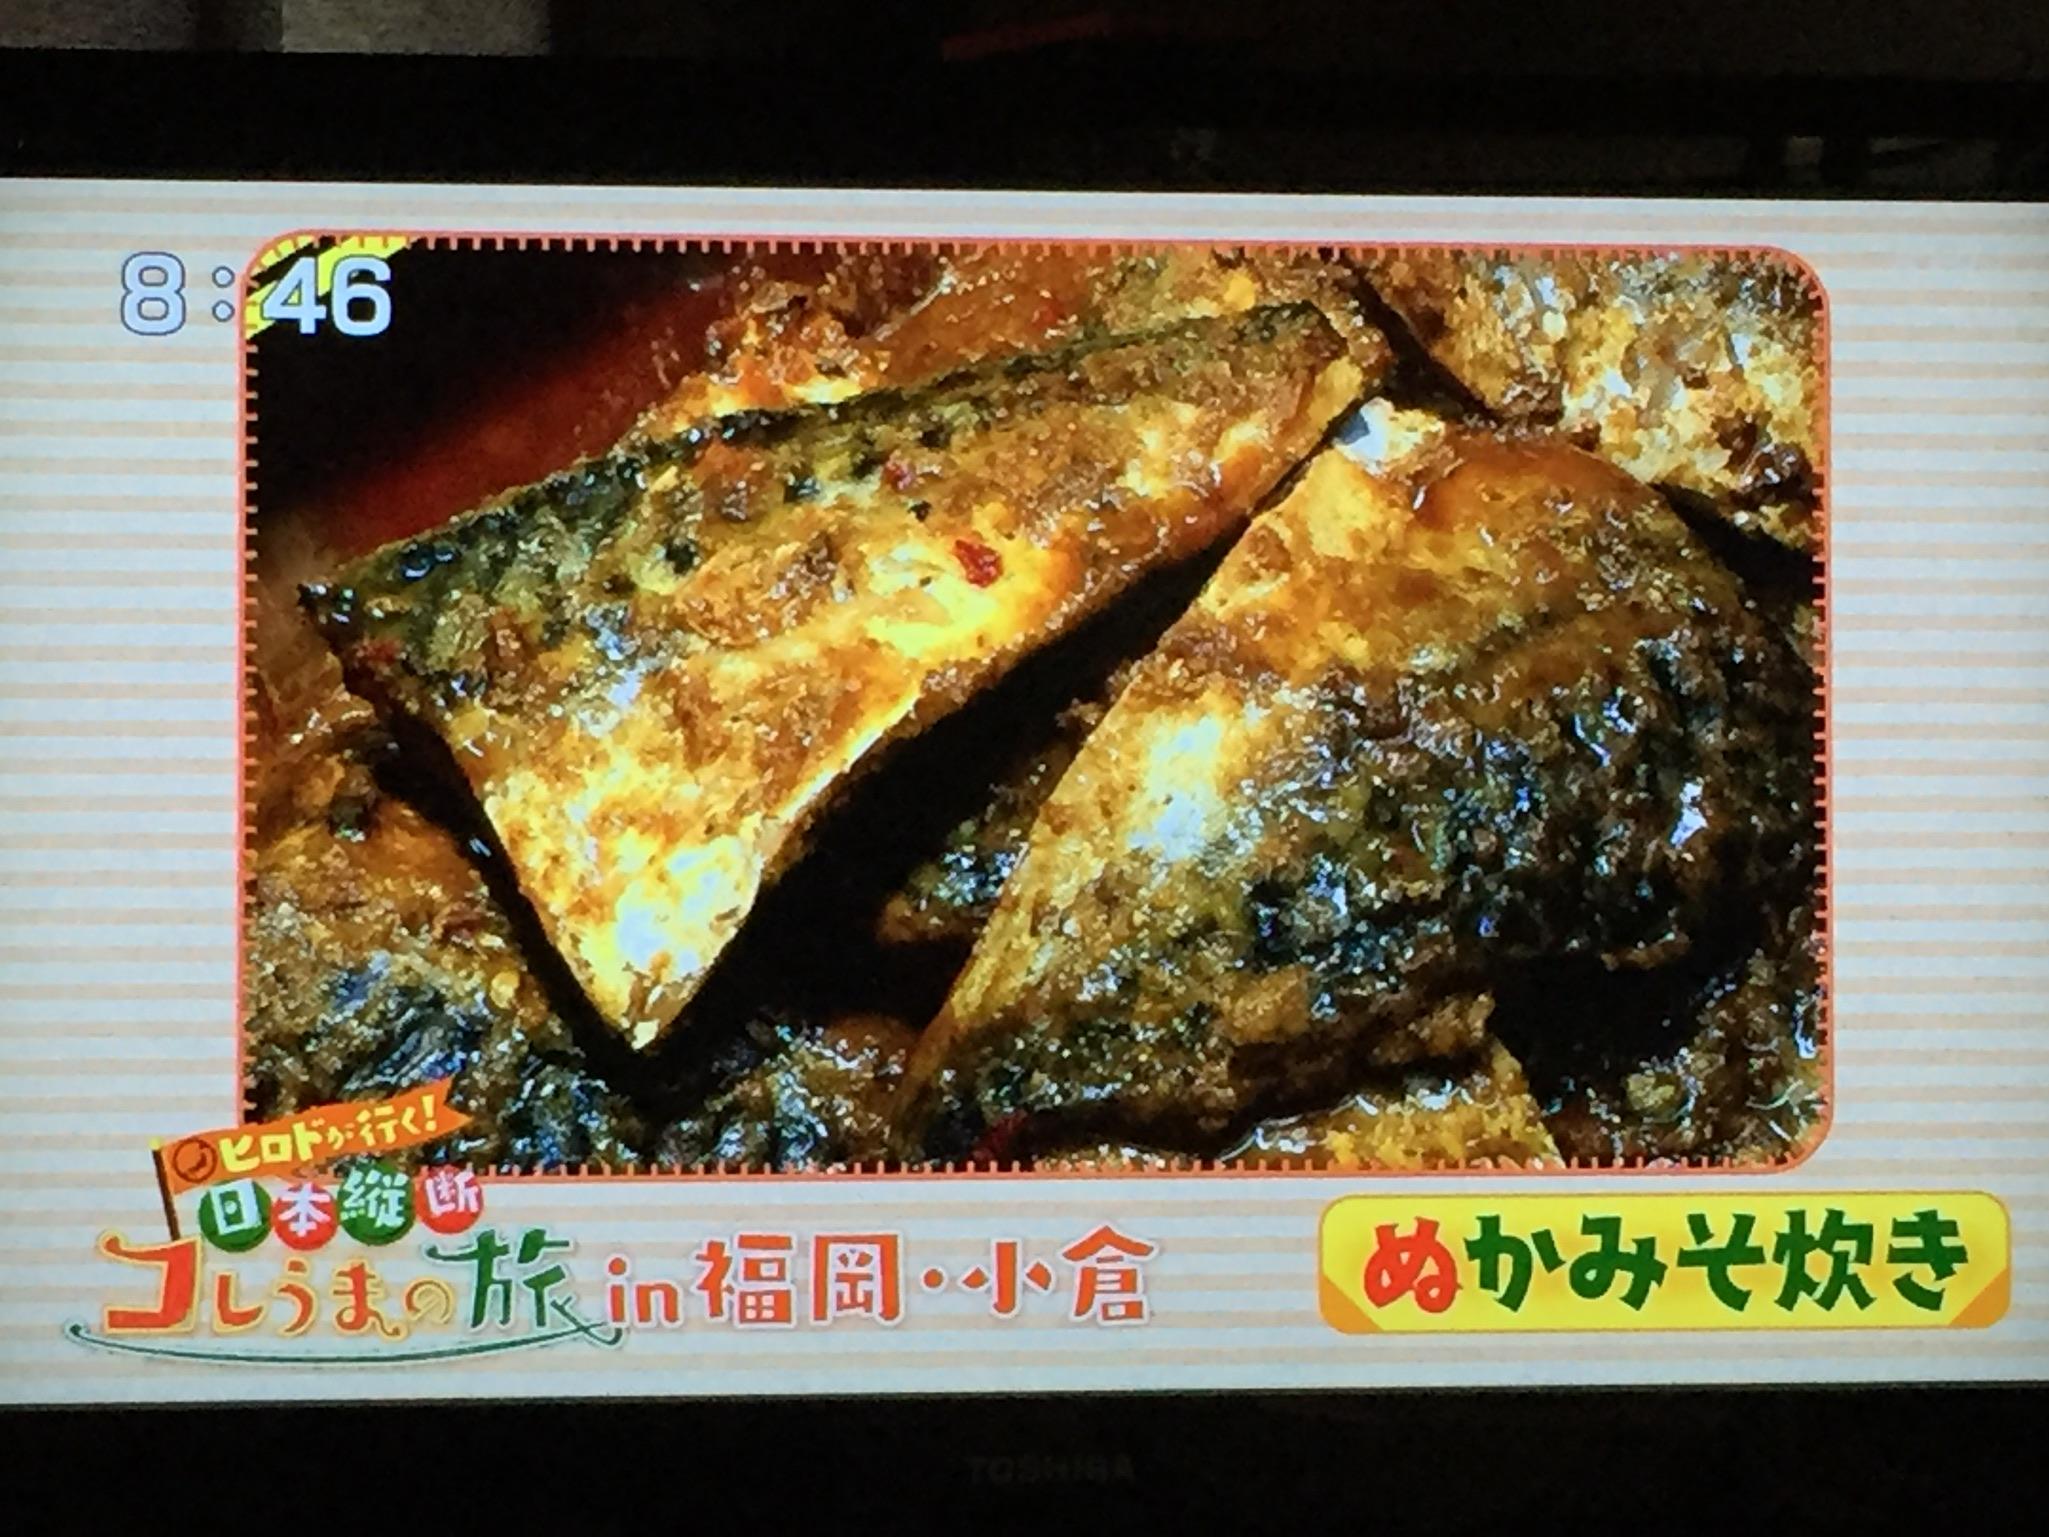 ABC朝日放送「朝だ!生です旅サラダ」